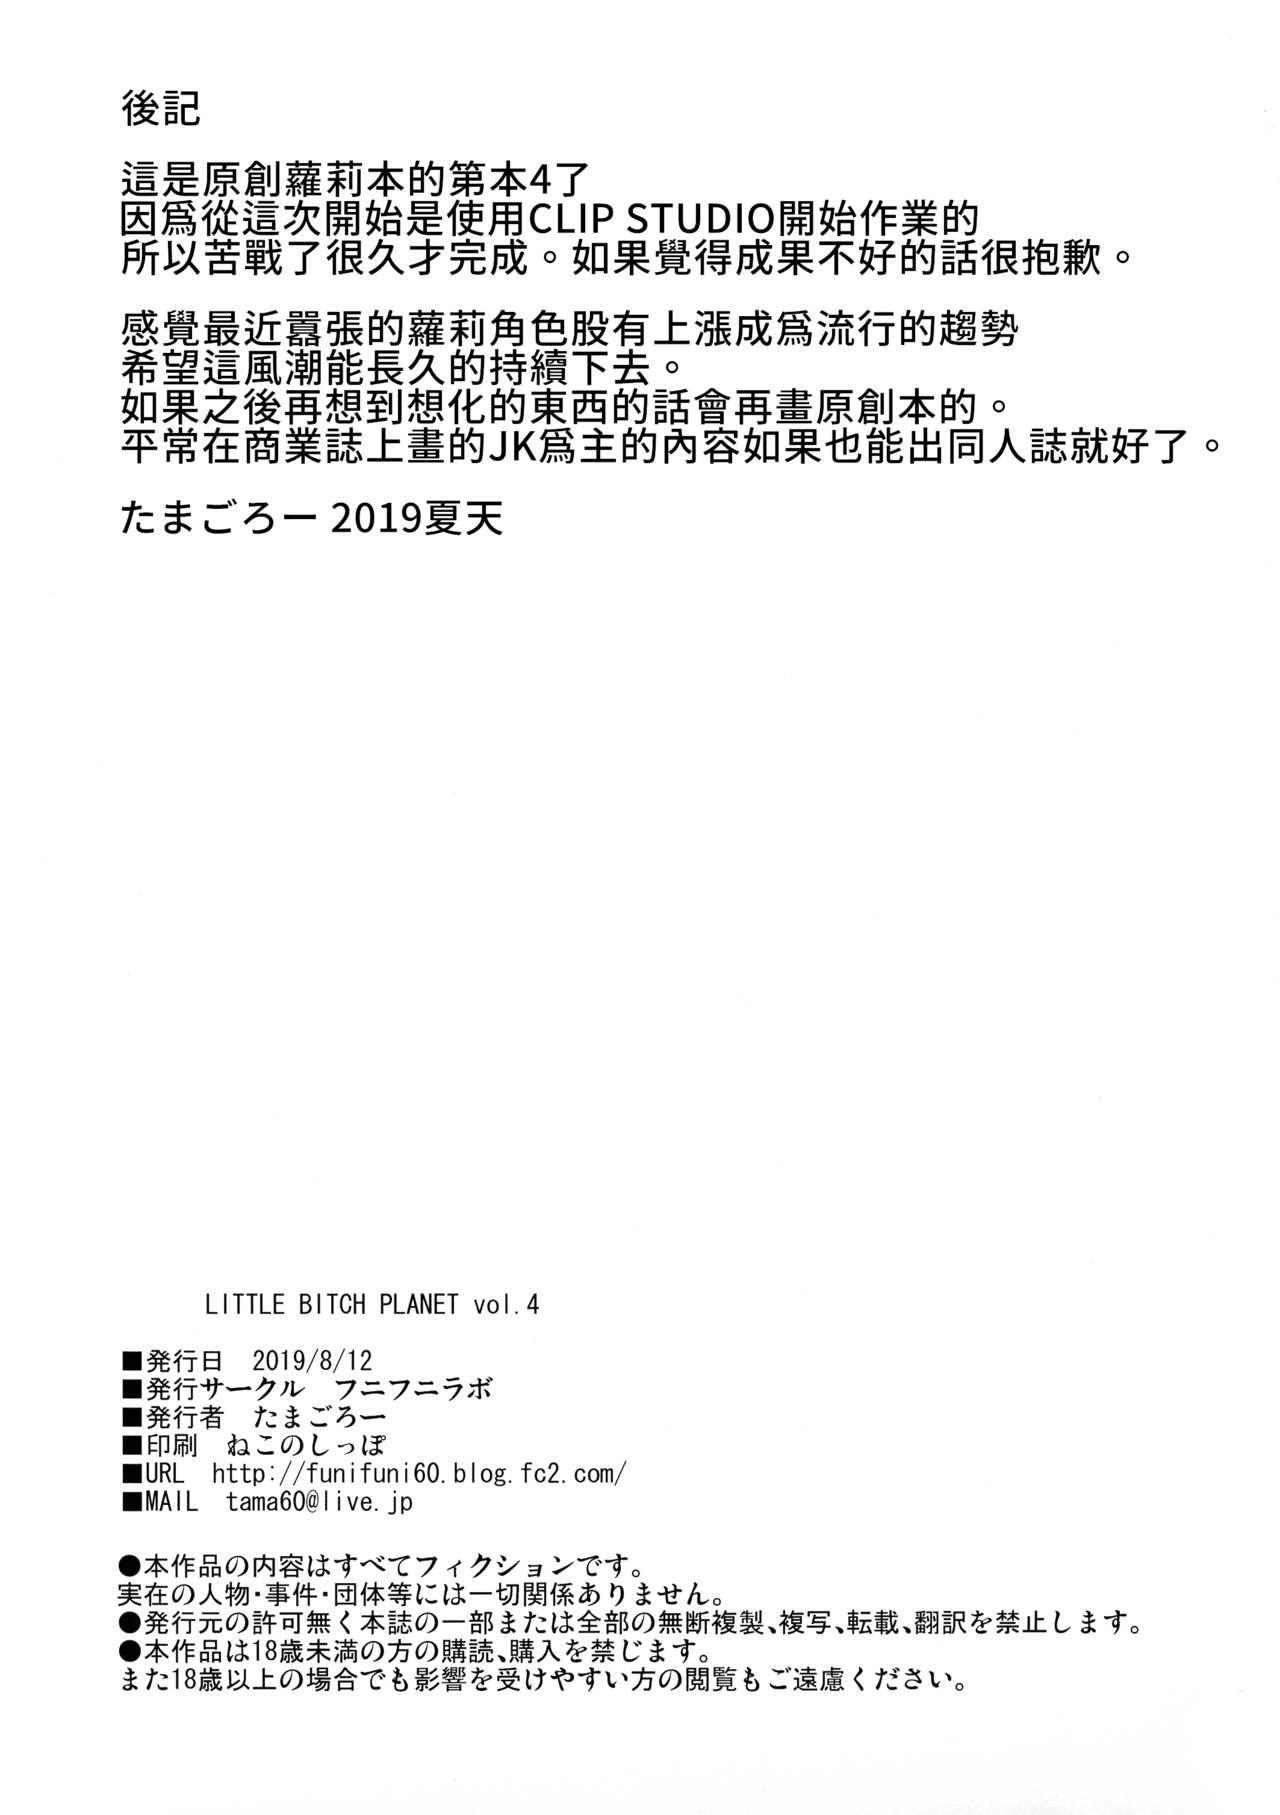 Little Bitch Planet Vol. 4   小小碧池星球 4 28